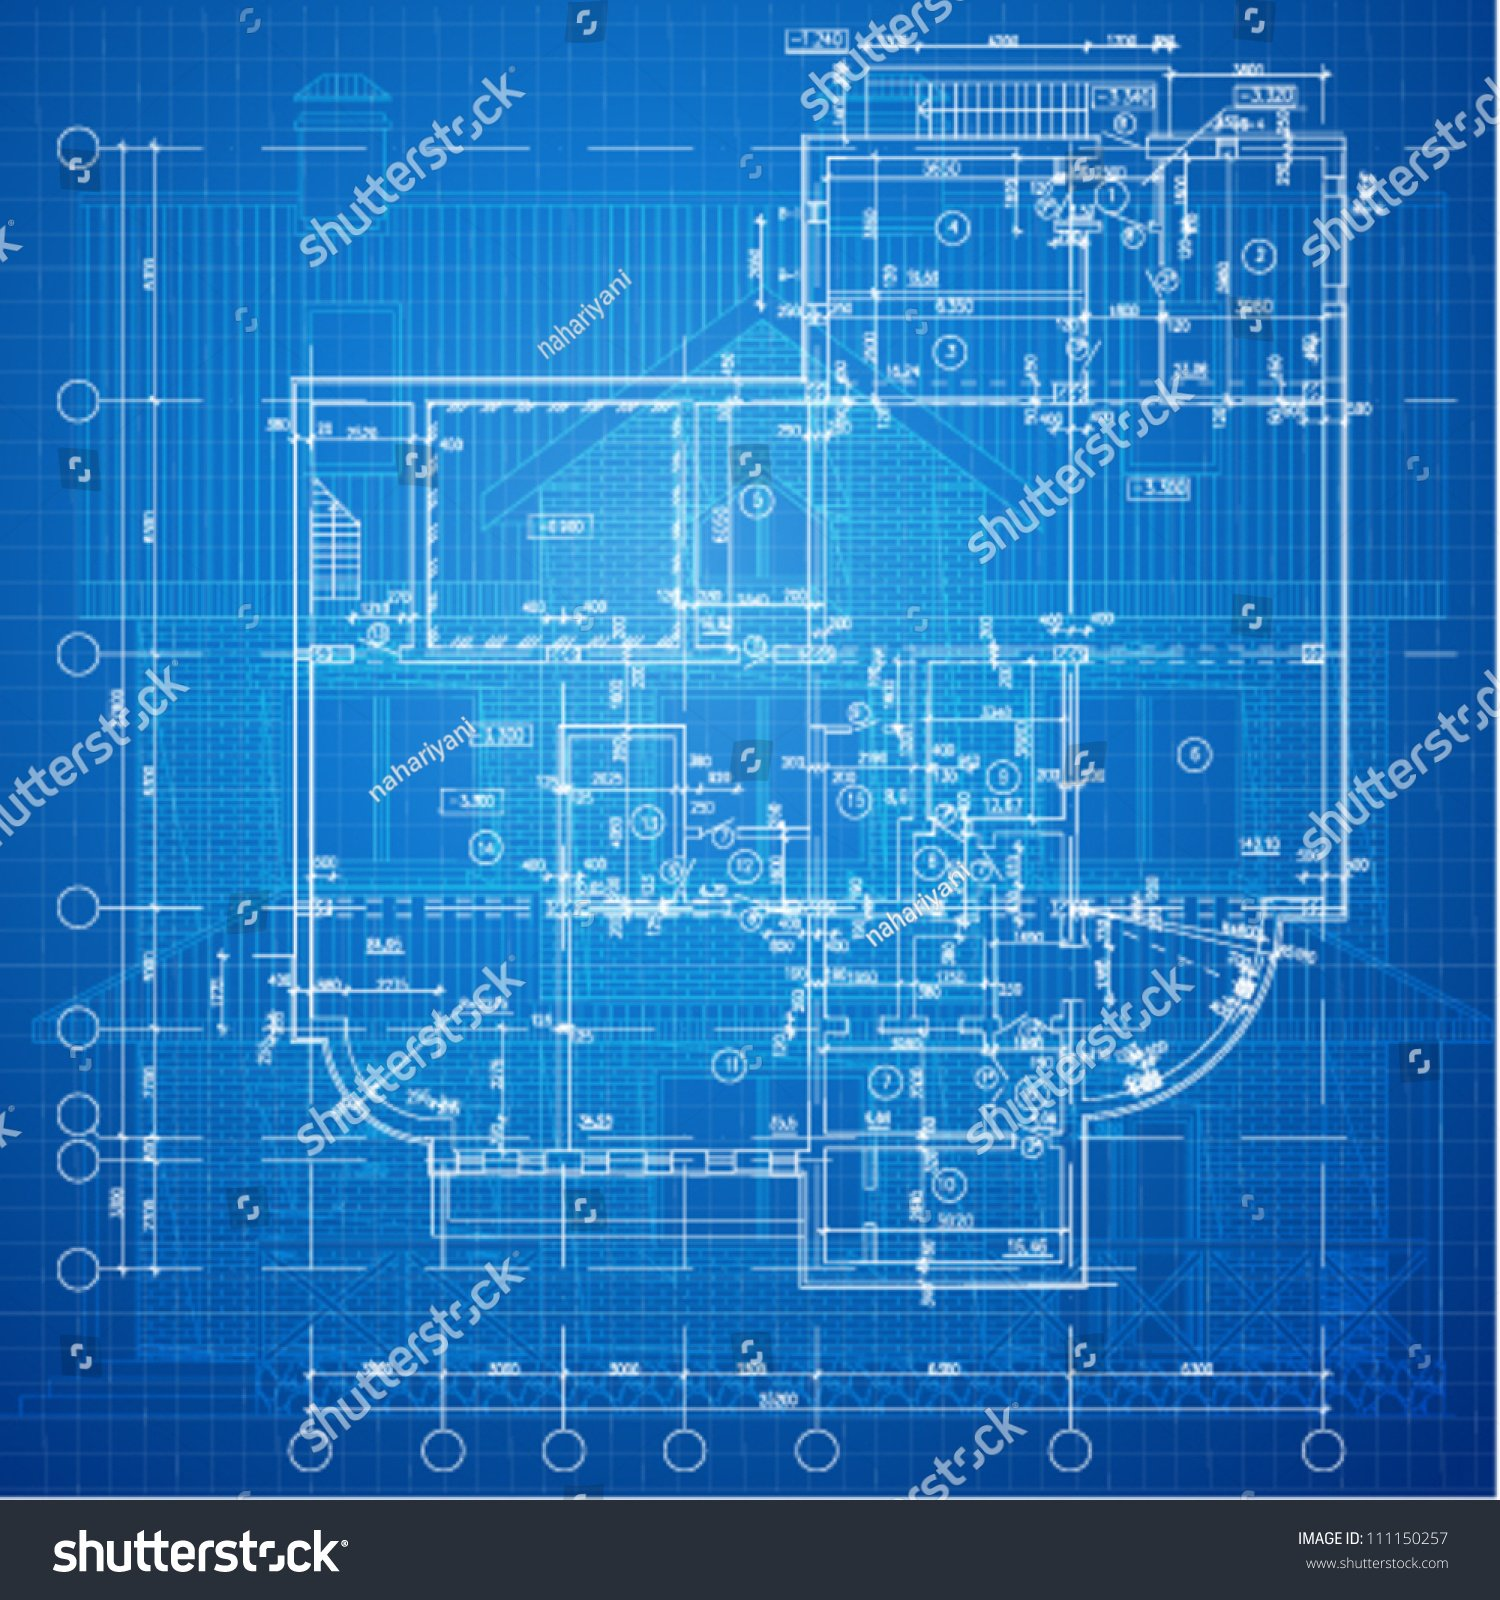 Urban Blueprint Vector Architectural Background Part Stock Vector 1500x1600